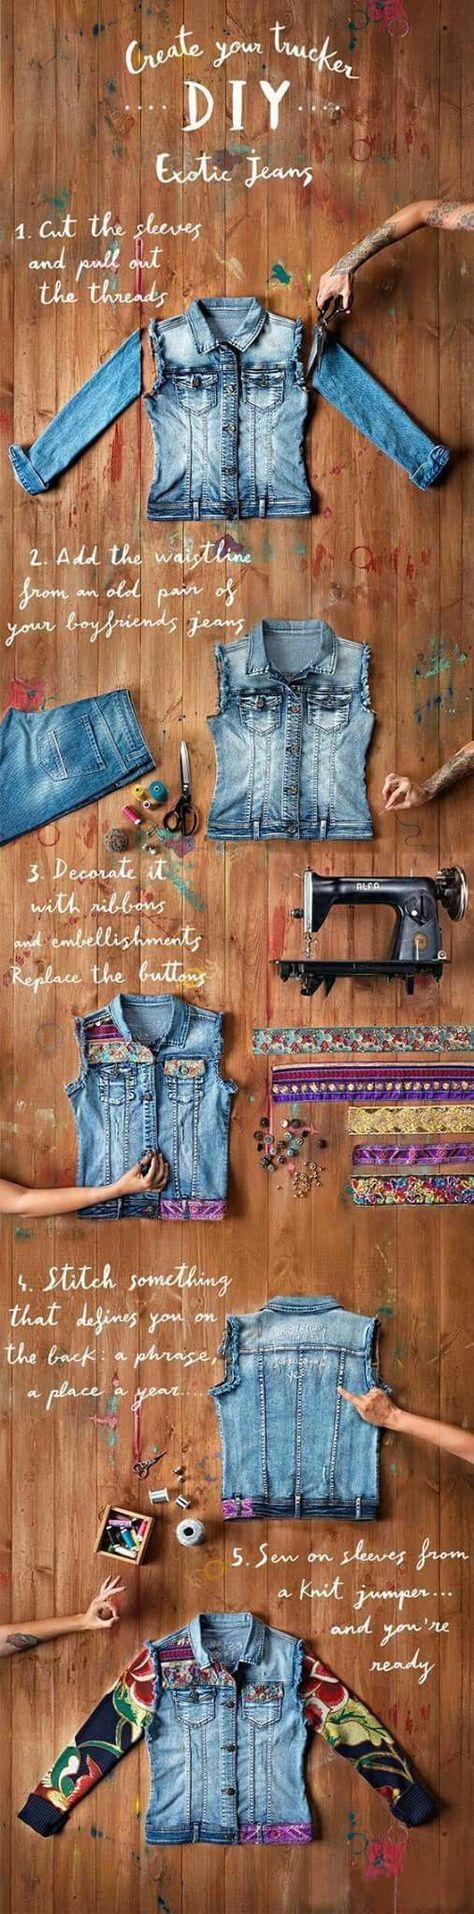 Desigual Diy / Reworking Jeans / SECOND STREET